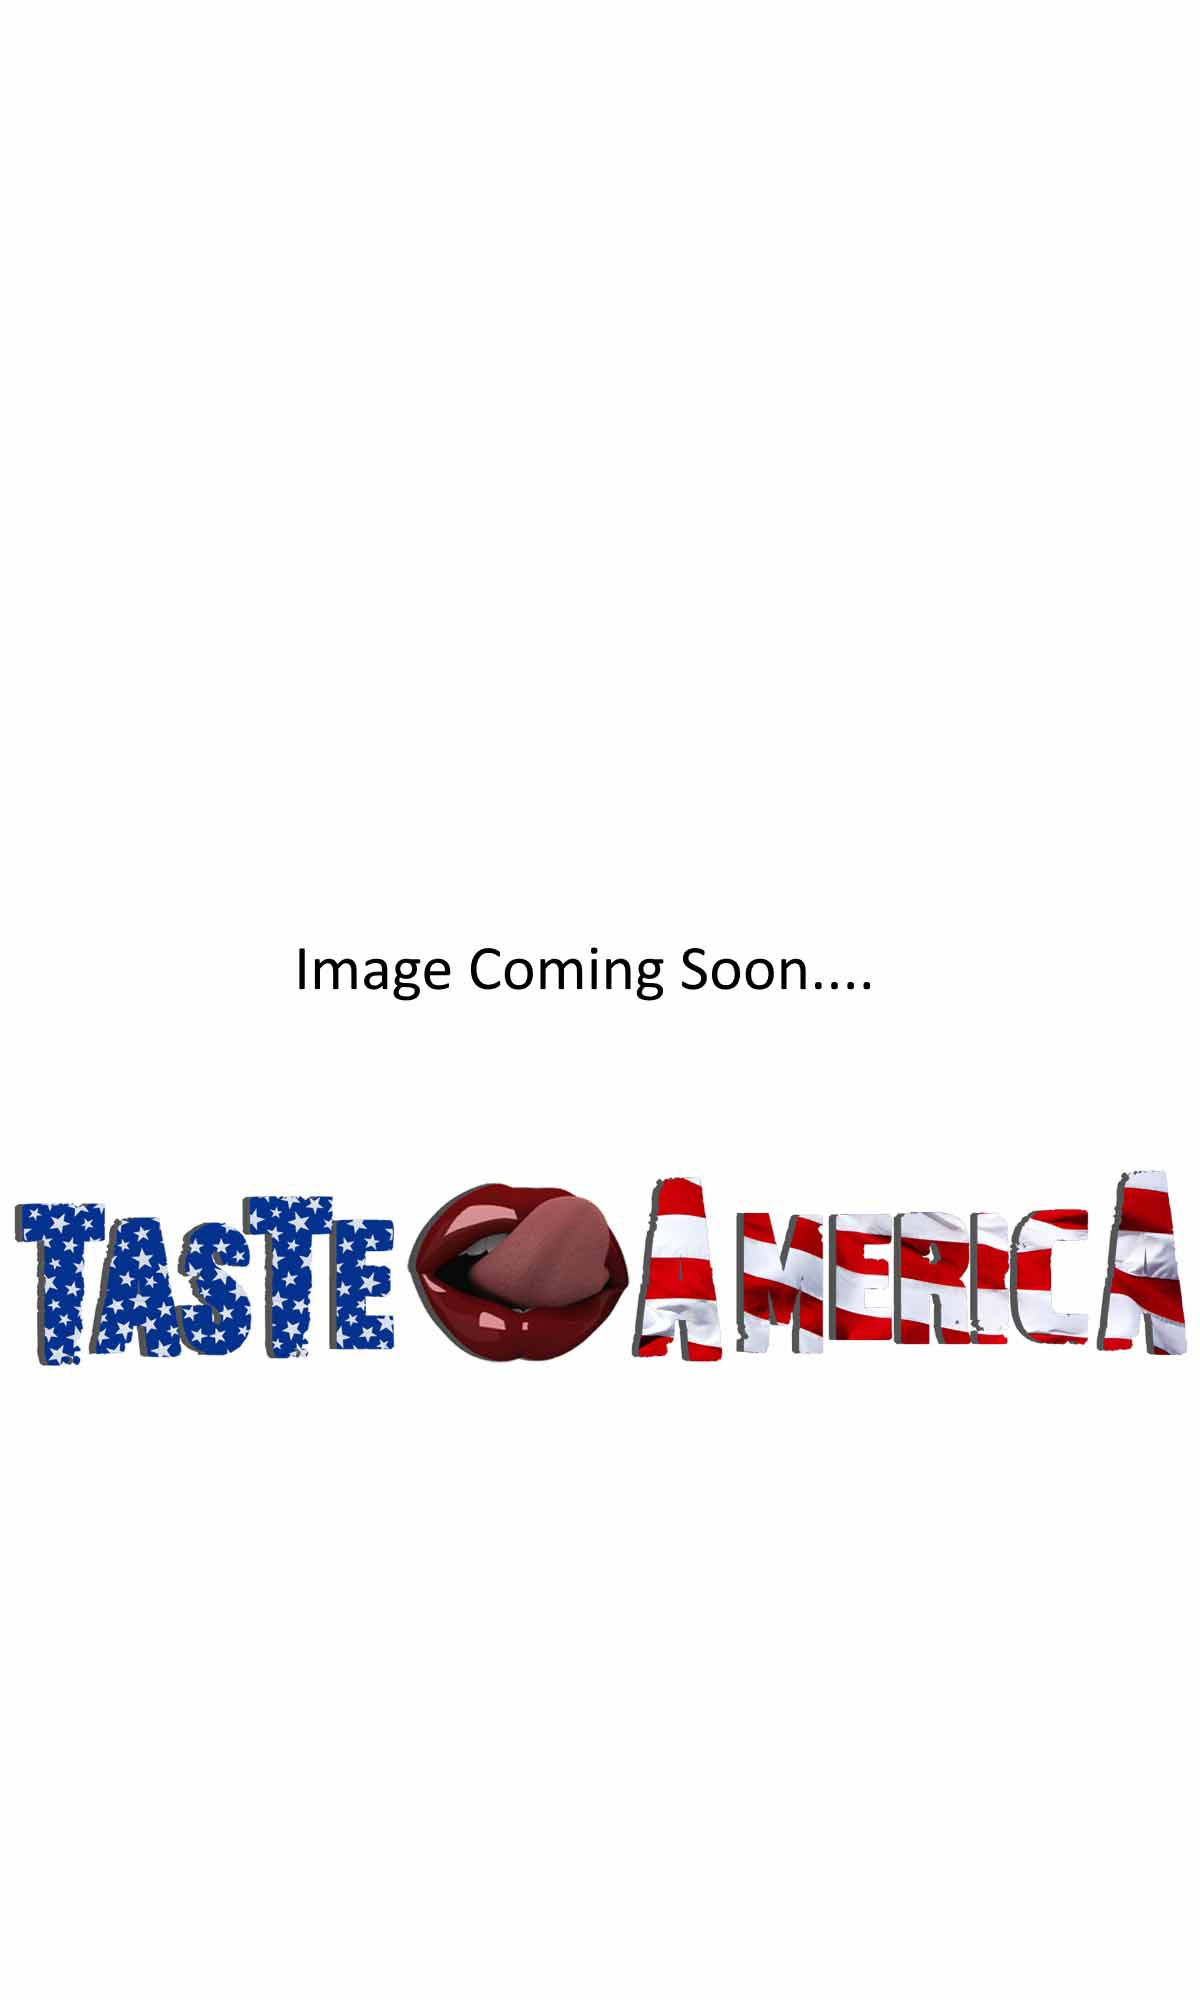 Buy Crystal Light Peach Mango Green Tea On The Go Drink Mix Sachets At Taste America UK